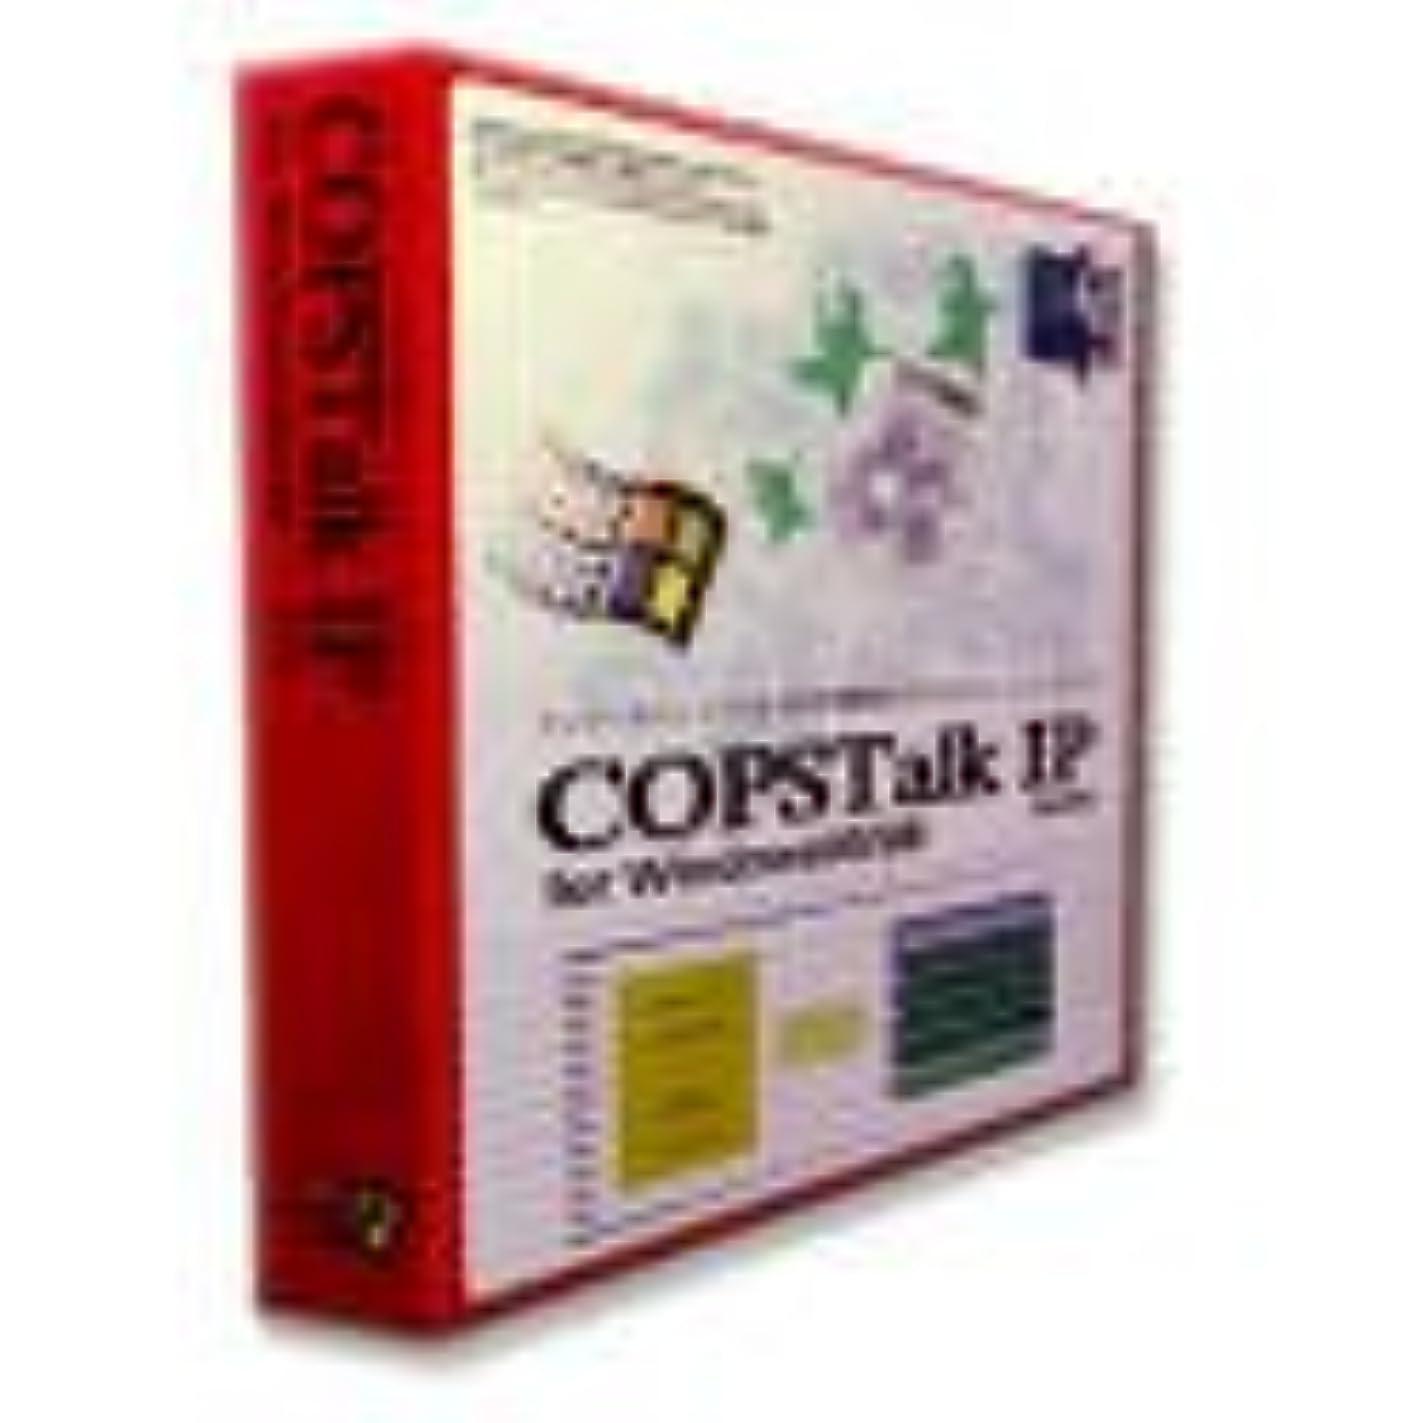 COPSTalk IP 2.5 日本語版